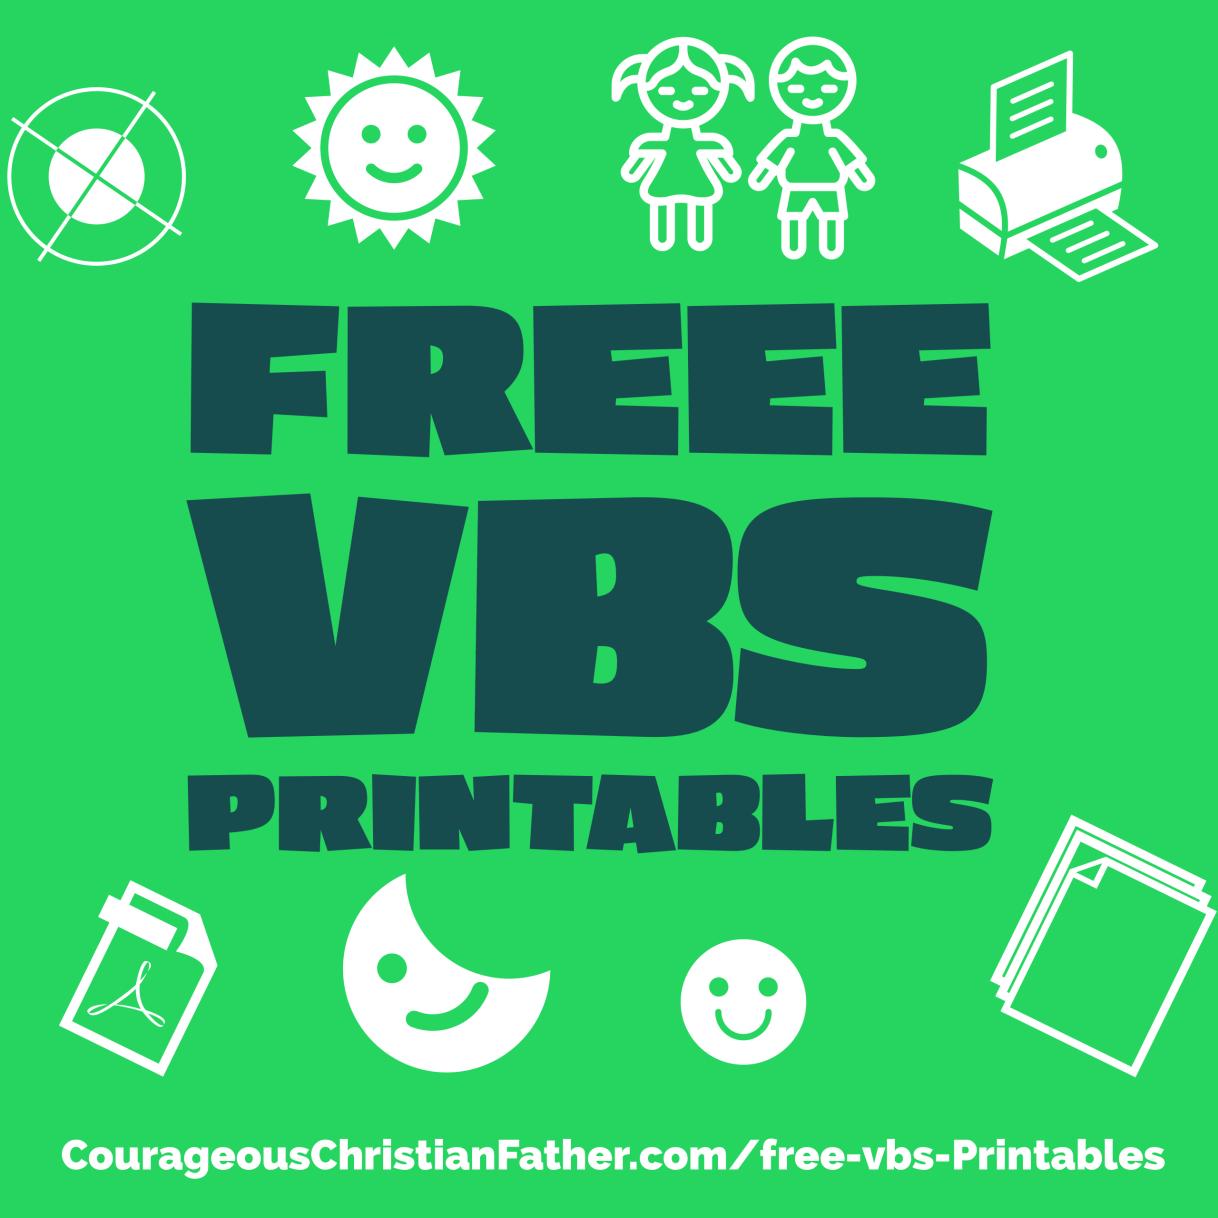 FREE VBS Printables